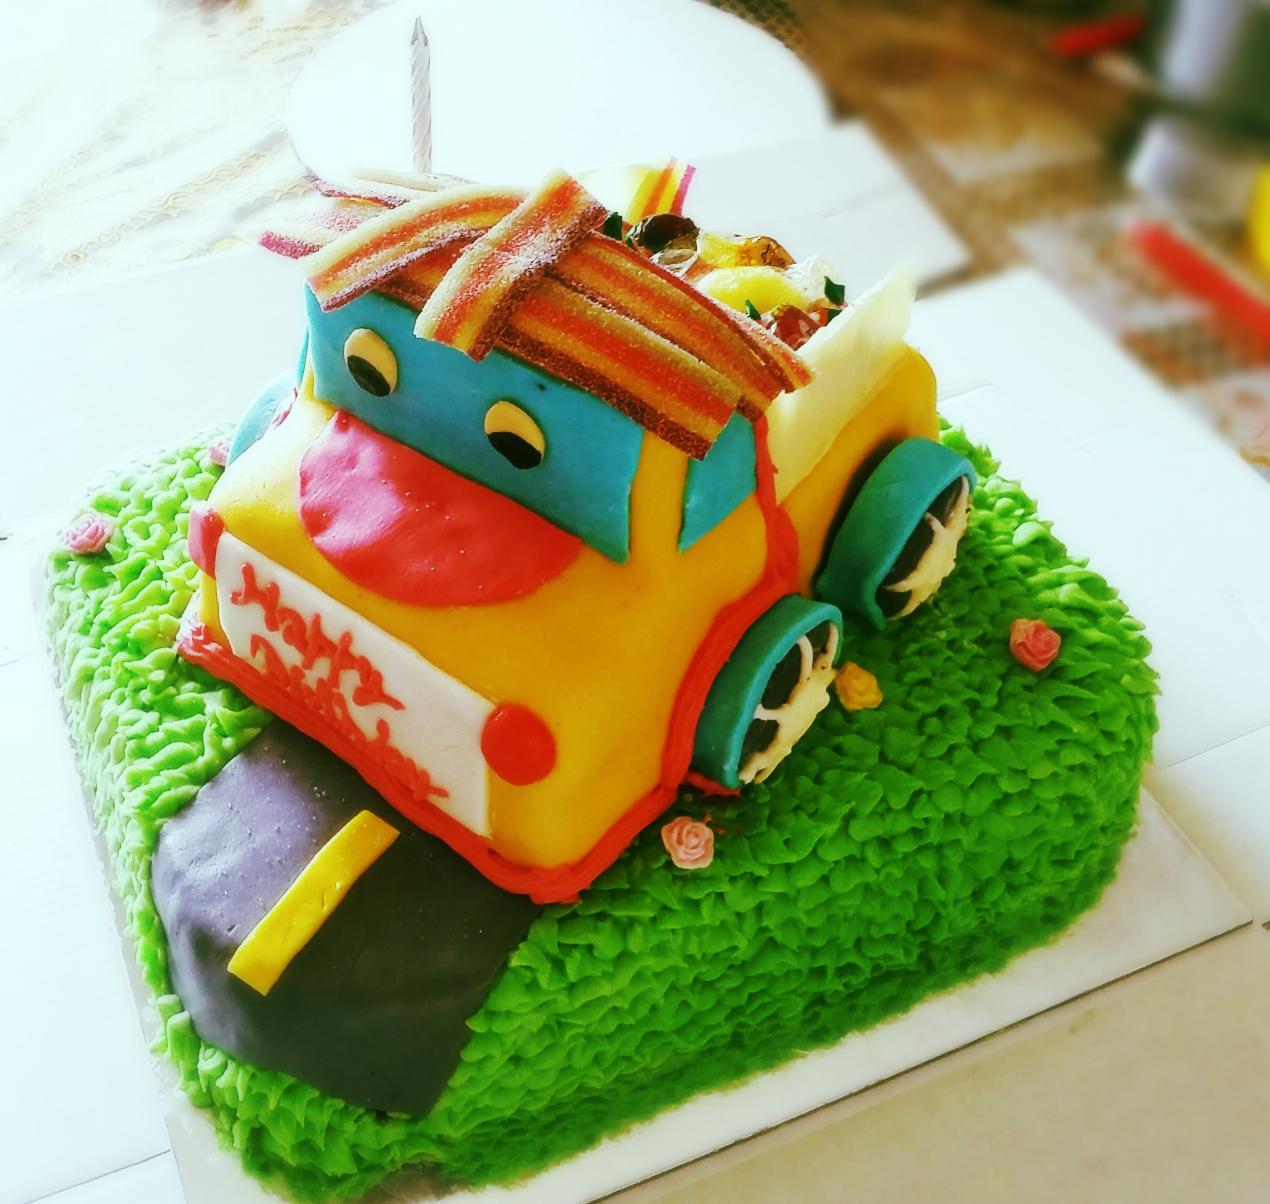 Truck theme